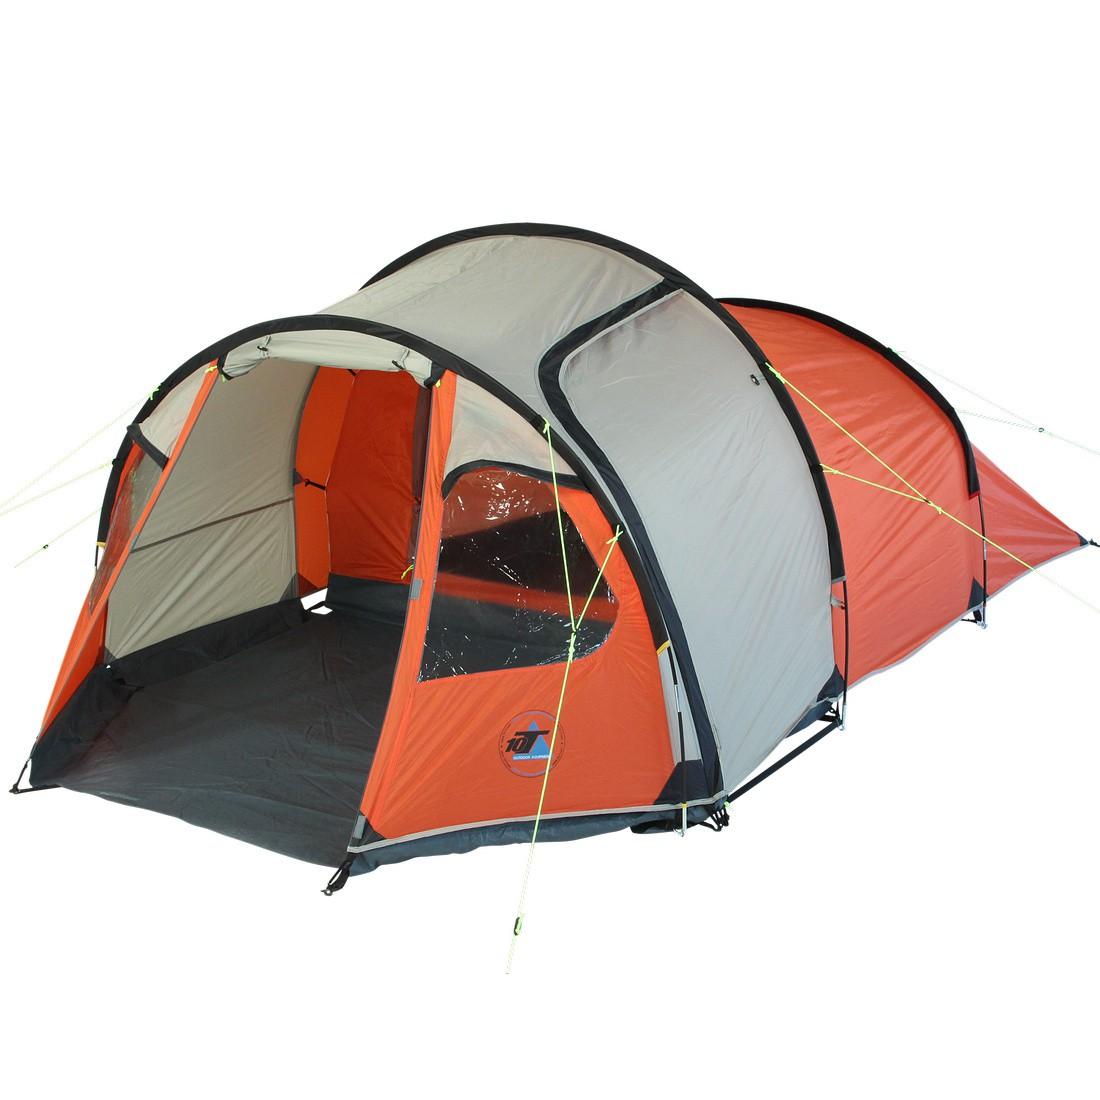 10t mandiga 3 orange tunnelzelt f r 3 personen. Black Bedroom Furniture Sets. Home Design Ideas